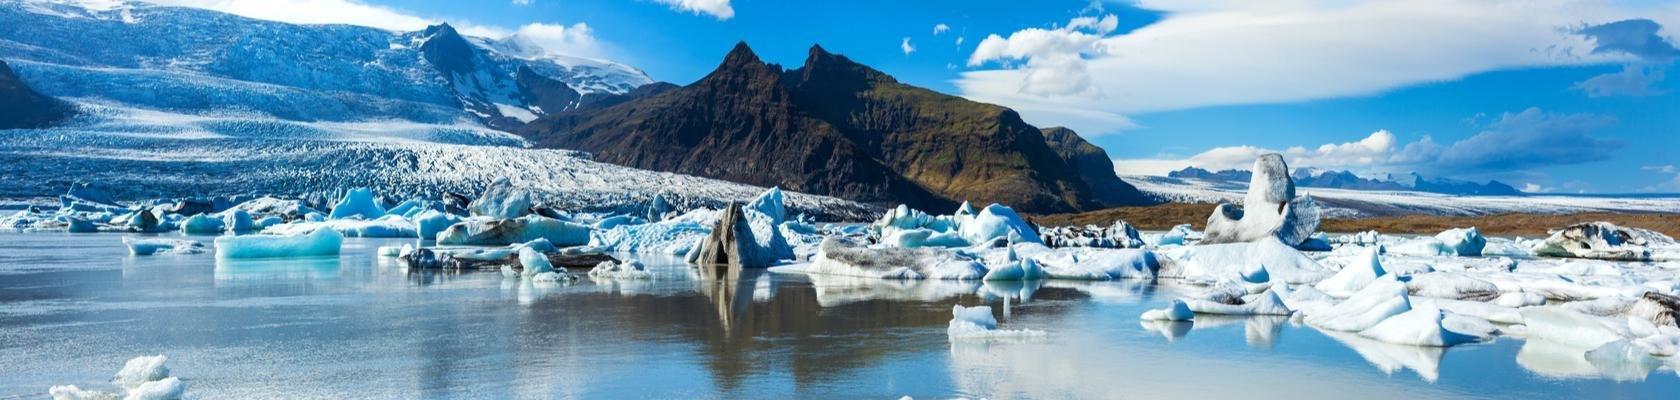 Jökulsárlón-gletsjerlagune